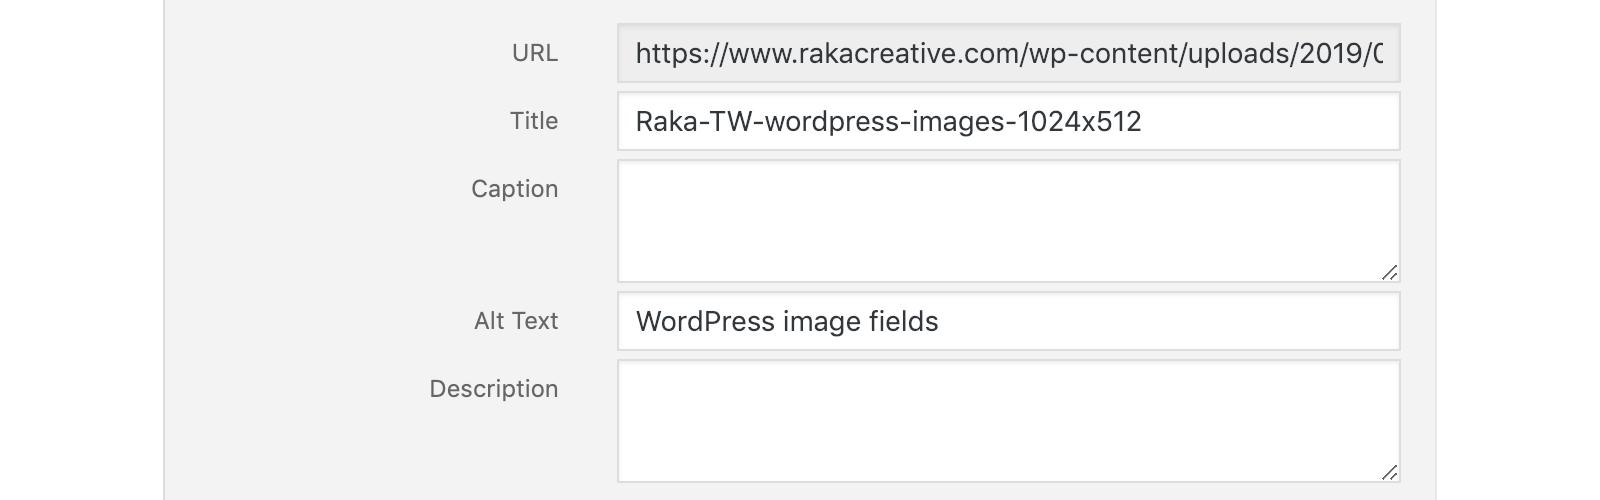 Optimizing WordPress Images: Title, Alt, Description, Huh?